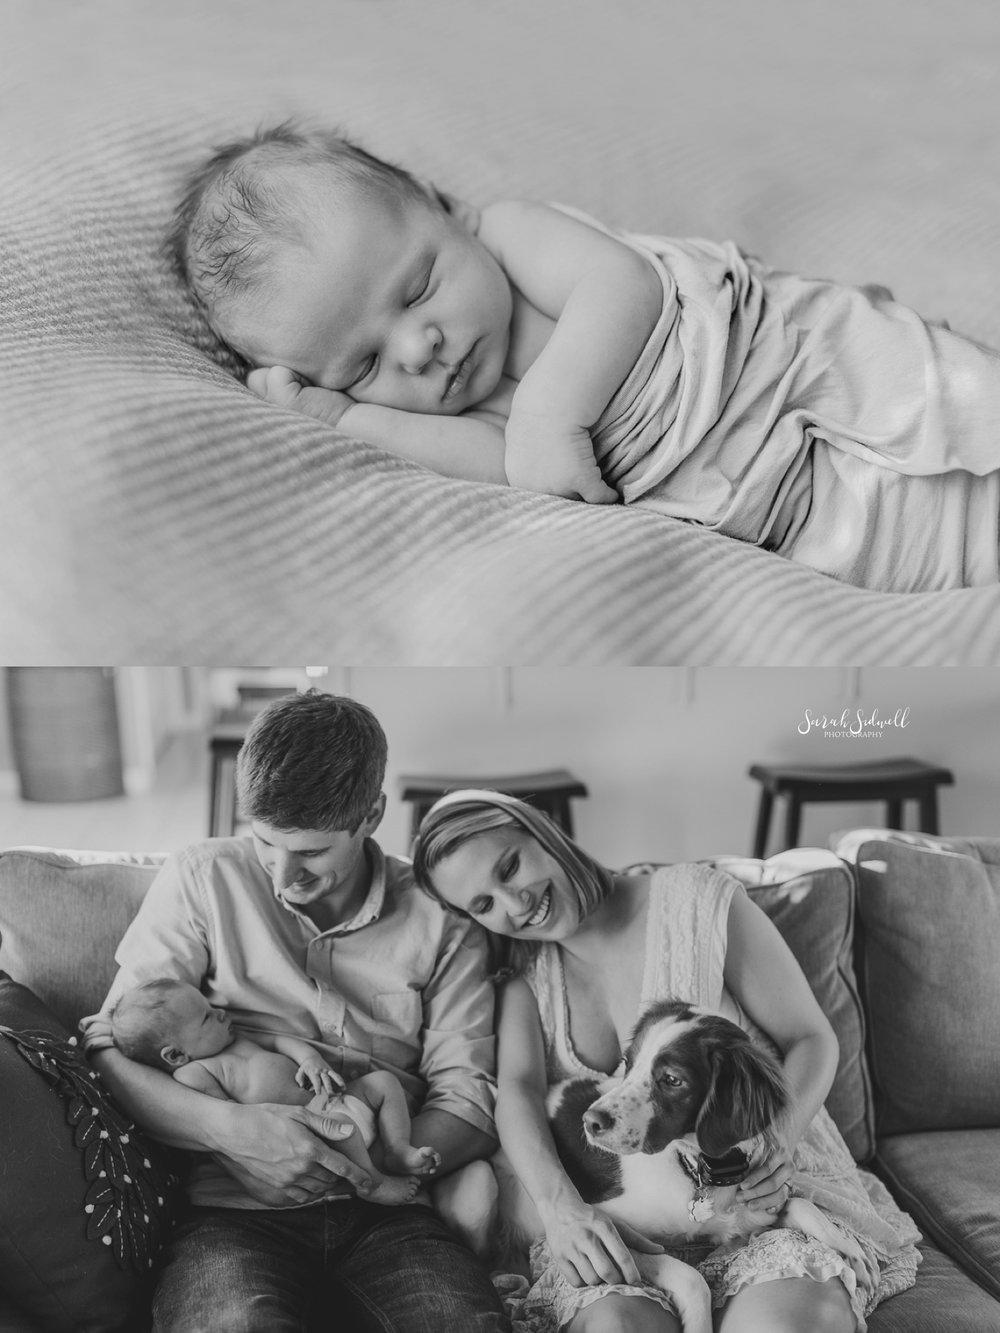 A newborn baby sleeps.